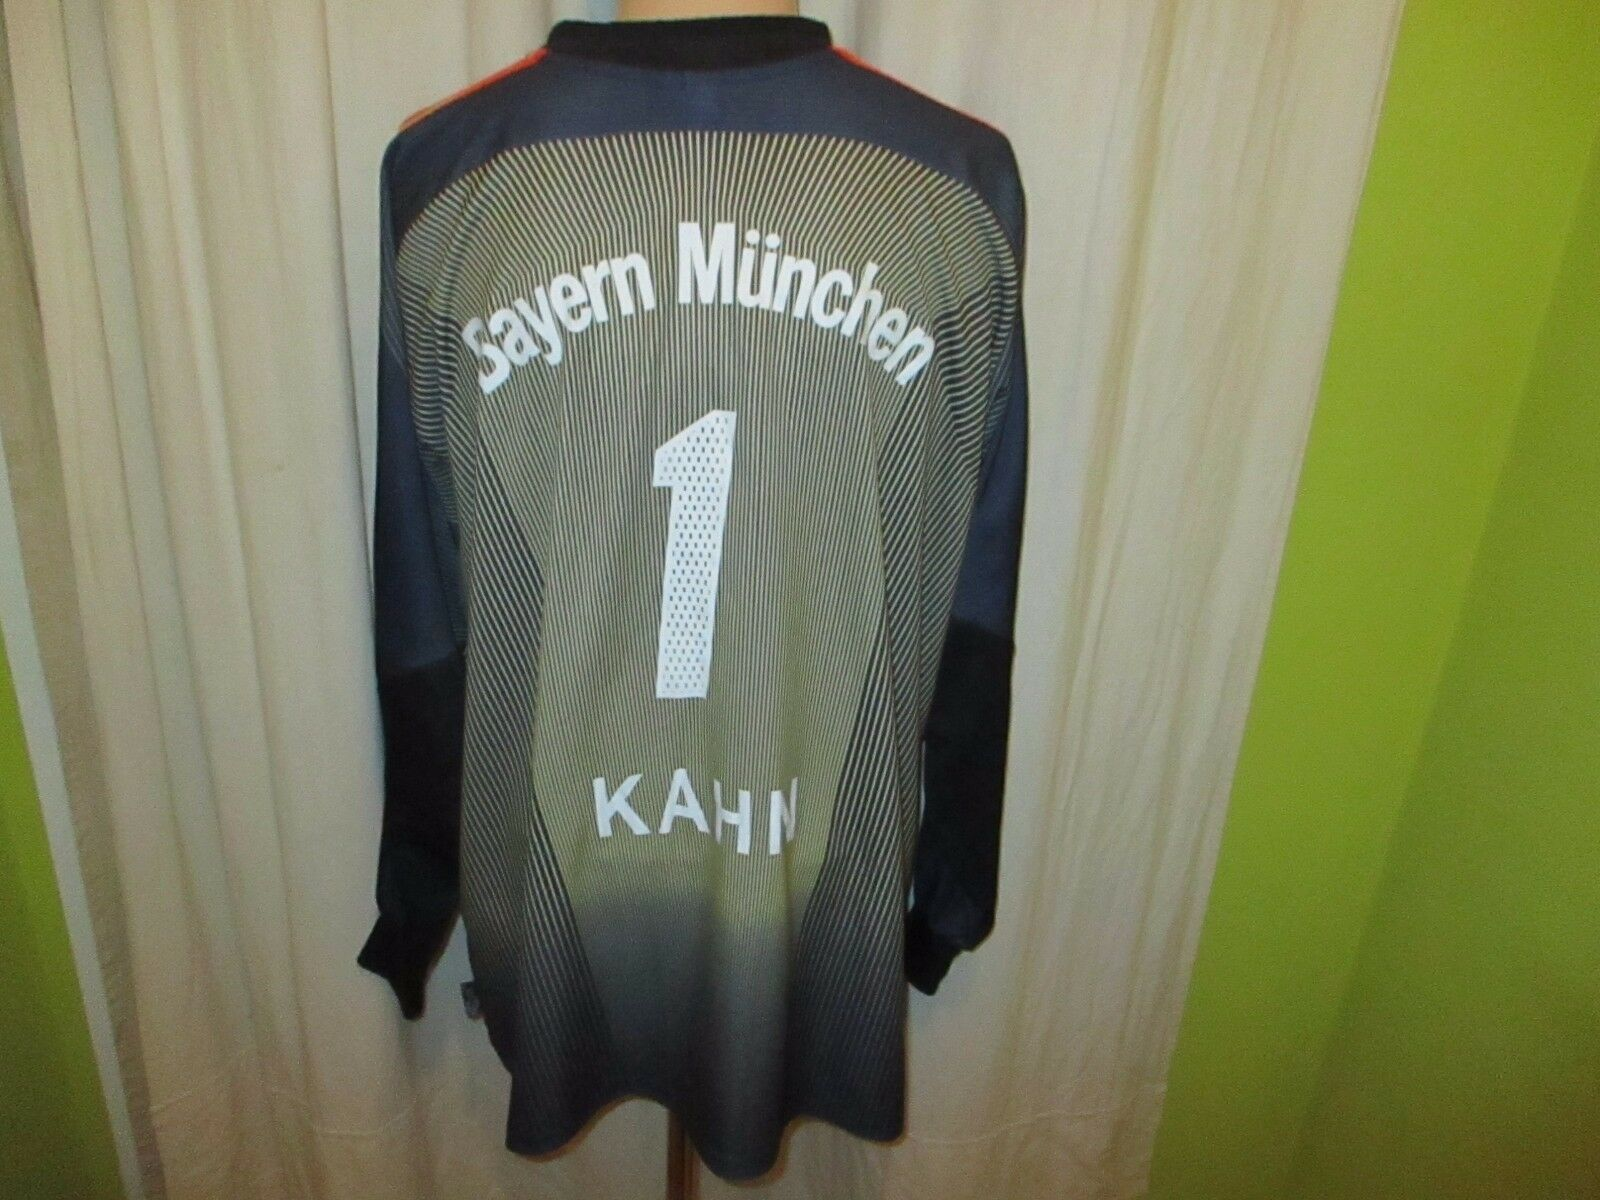 FC Bayern München Original Torwart Trikot 03 04  -T---Mobile  + Nr.1 Kahn Gr.XXL  | Online Outlet Store